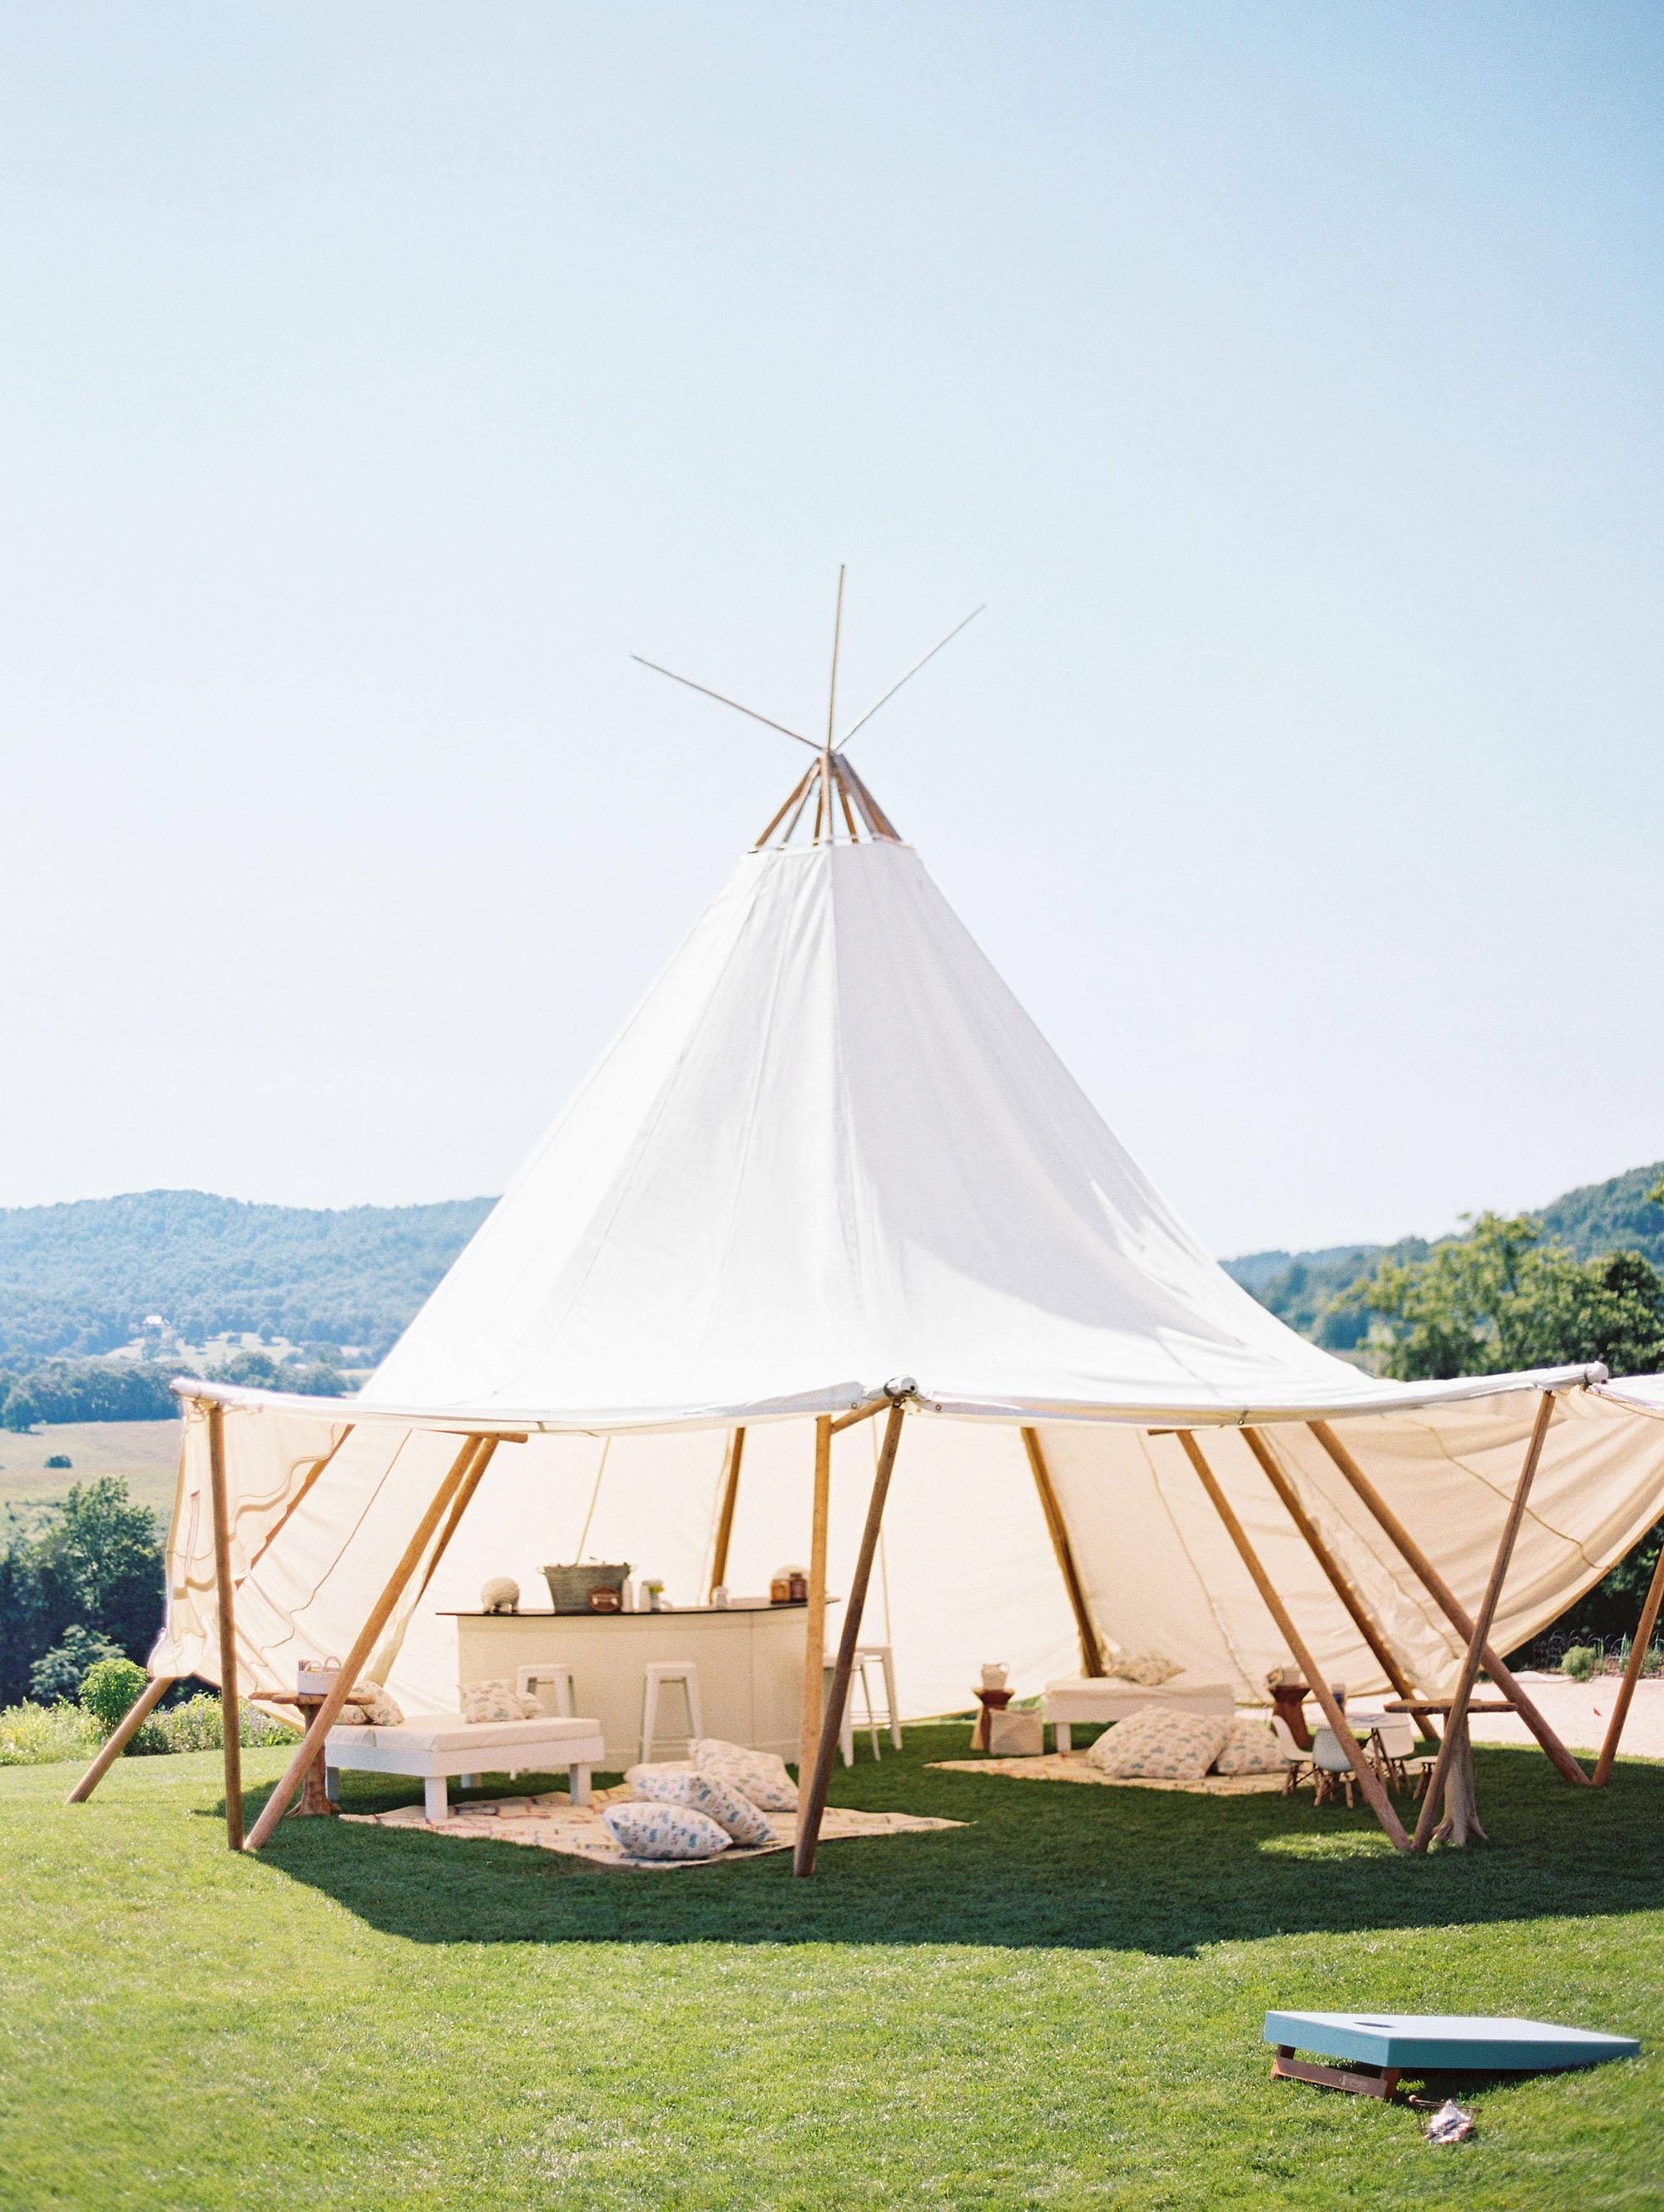 hannah chris wedding north garden va teepee